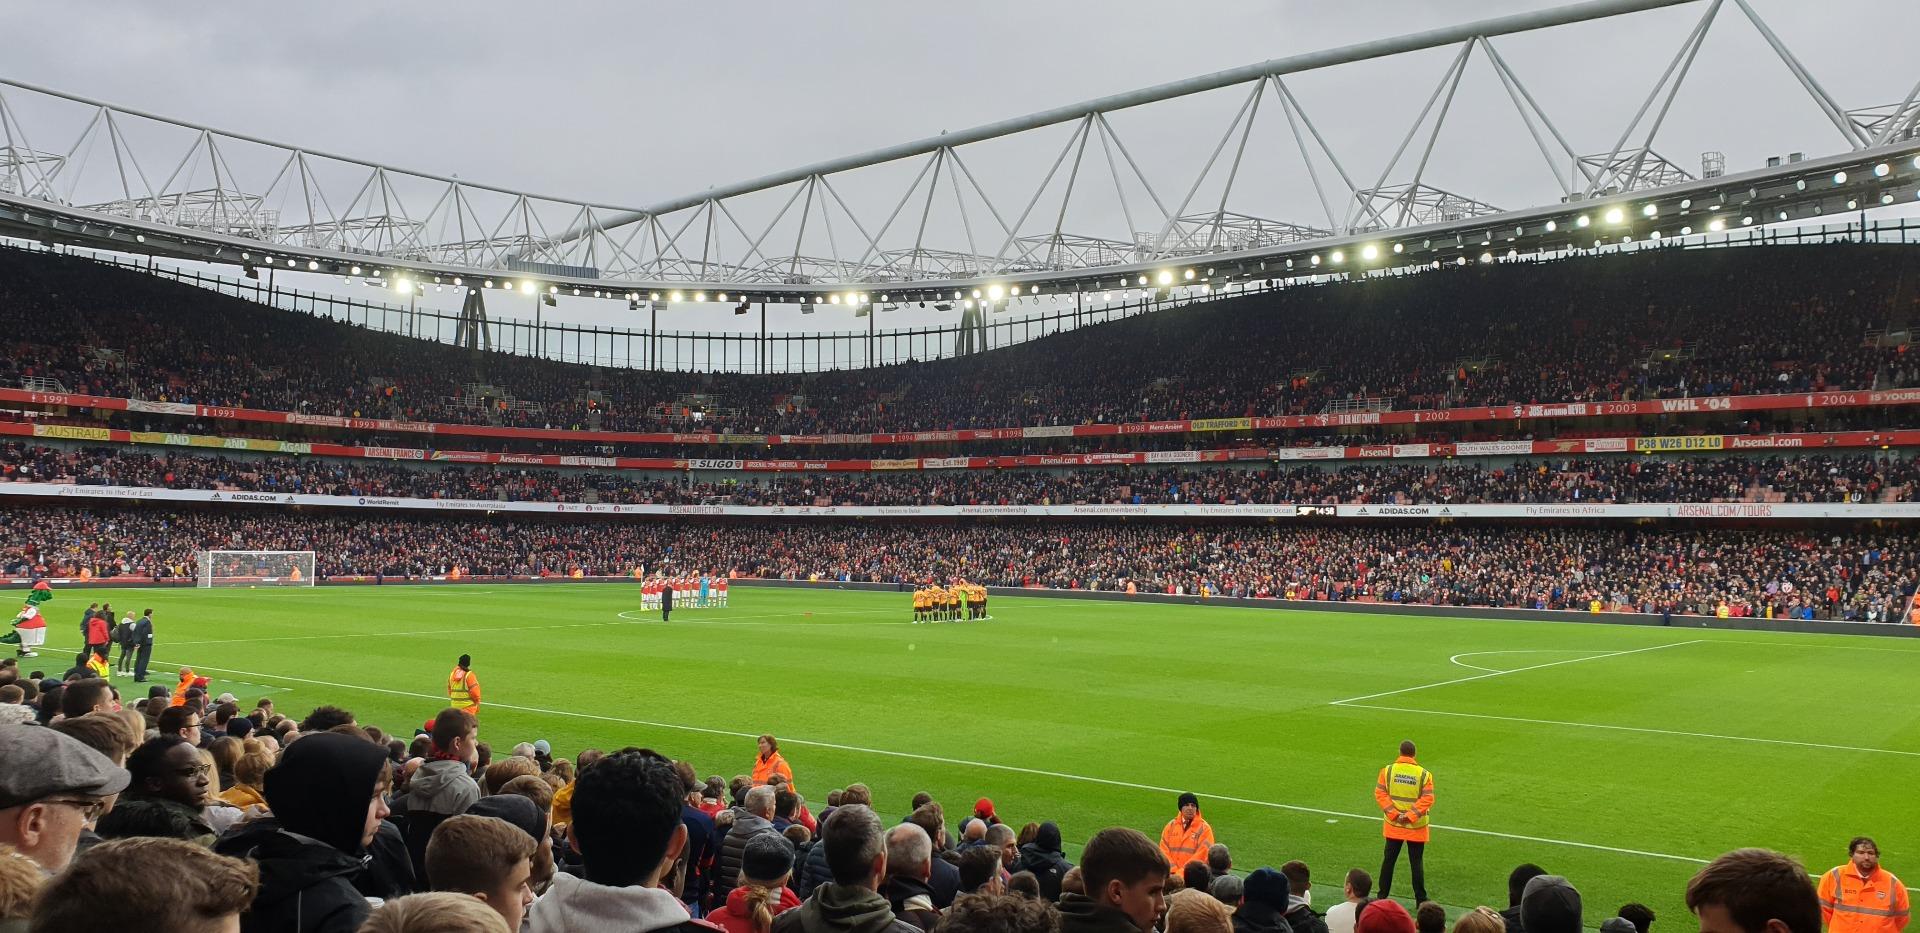 Emirates Stadium Section 29 Row 15 Seat 918